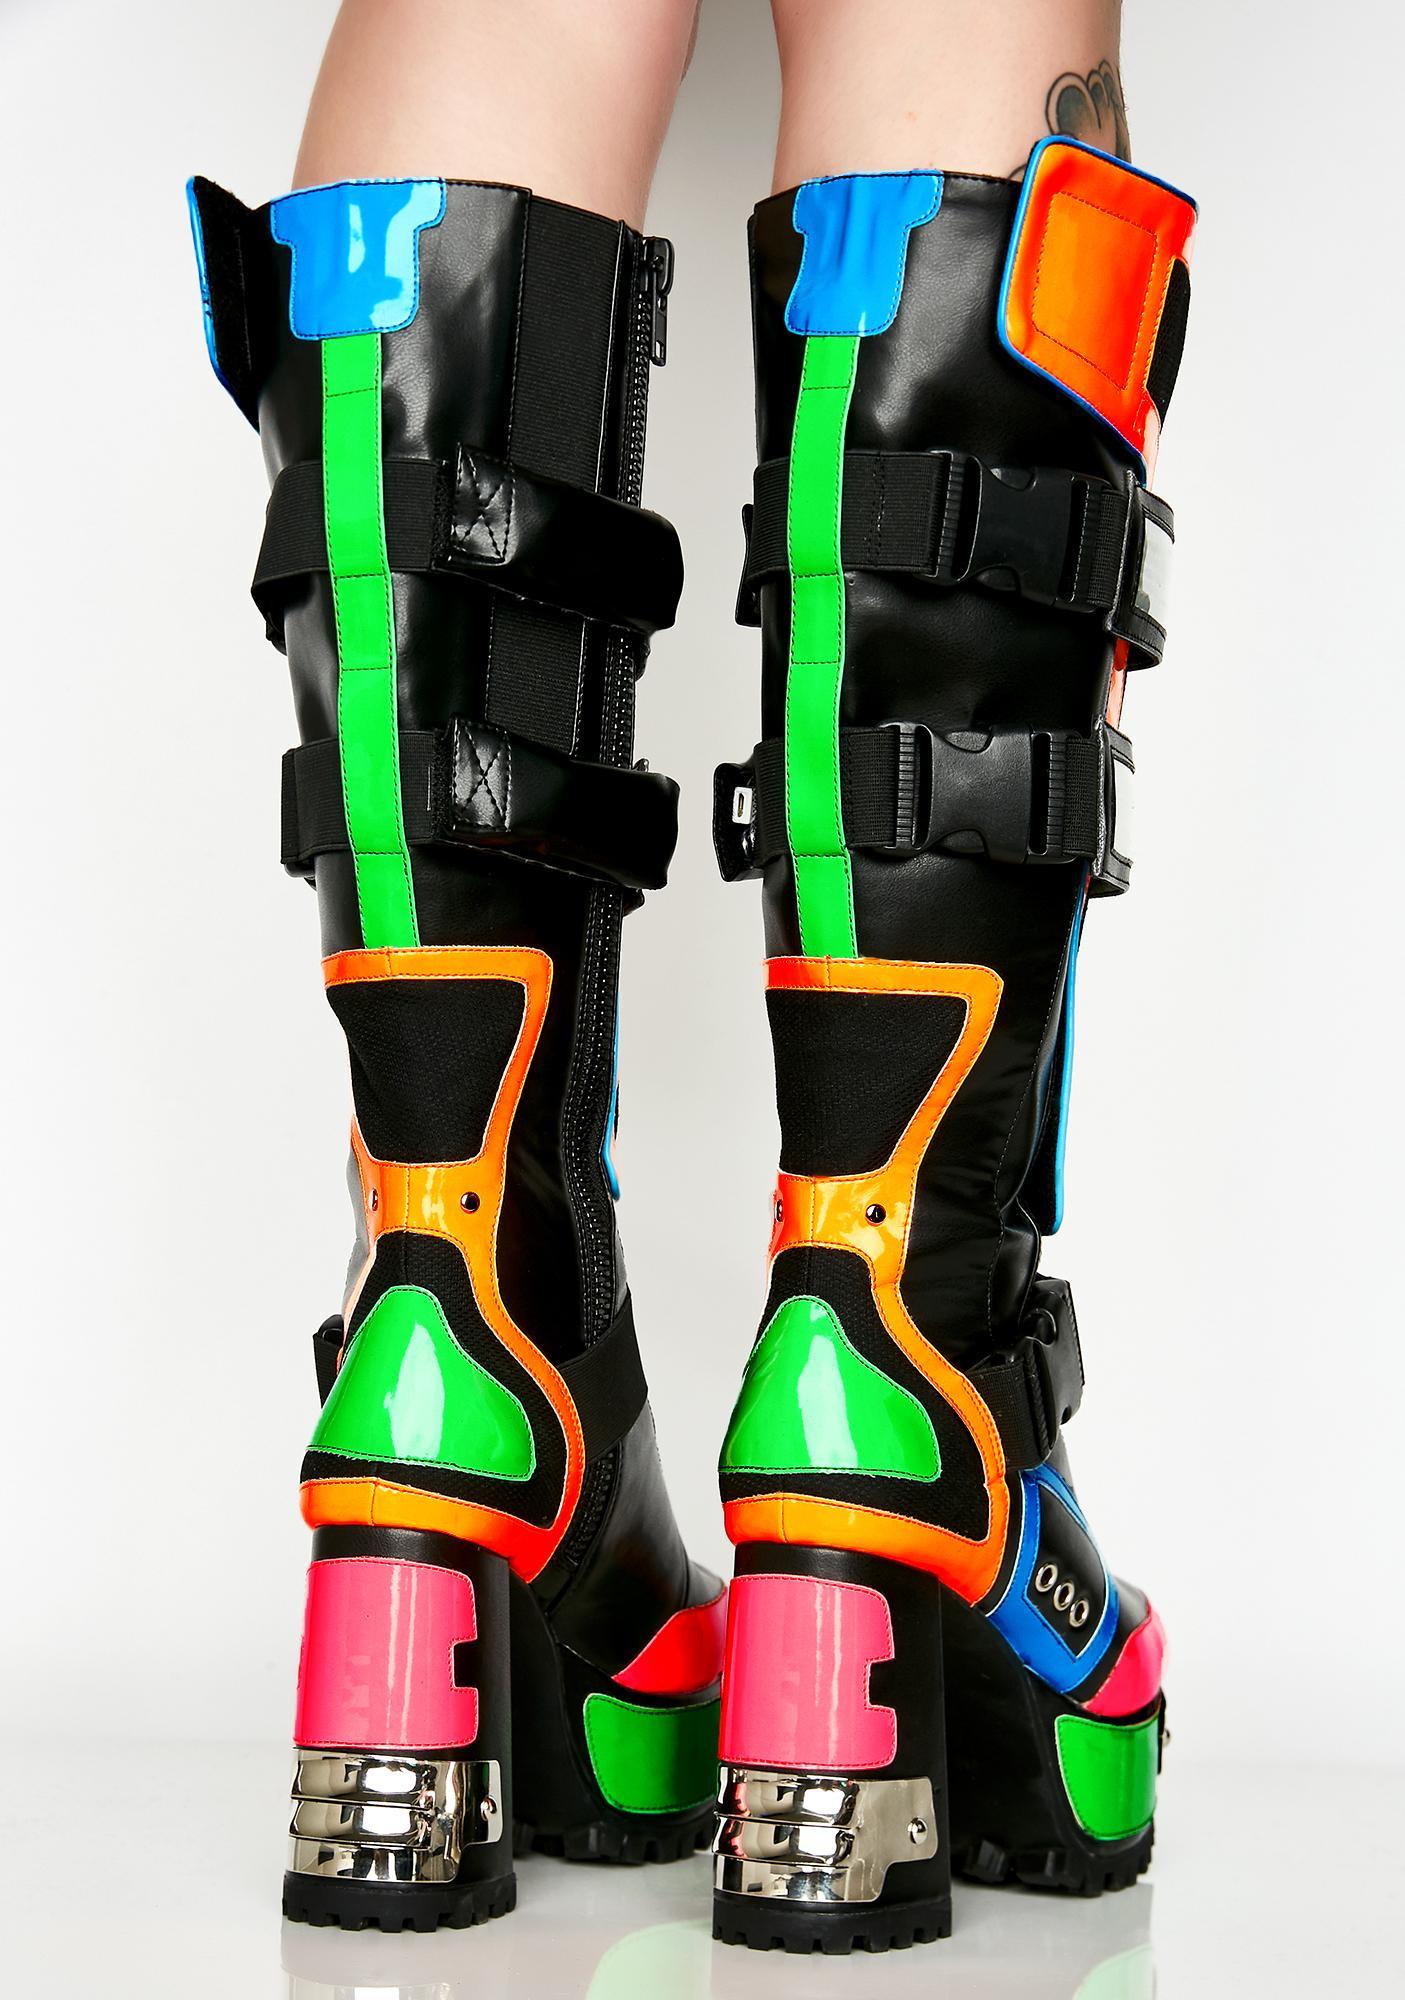 Club Exx Cybertron Babe Platform Boots